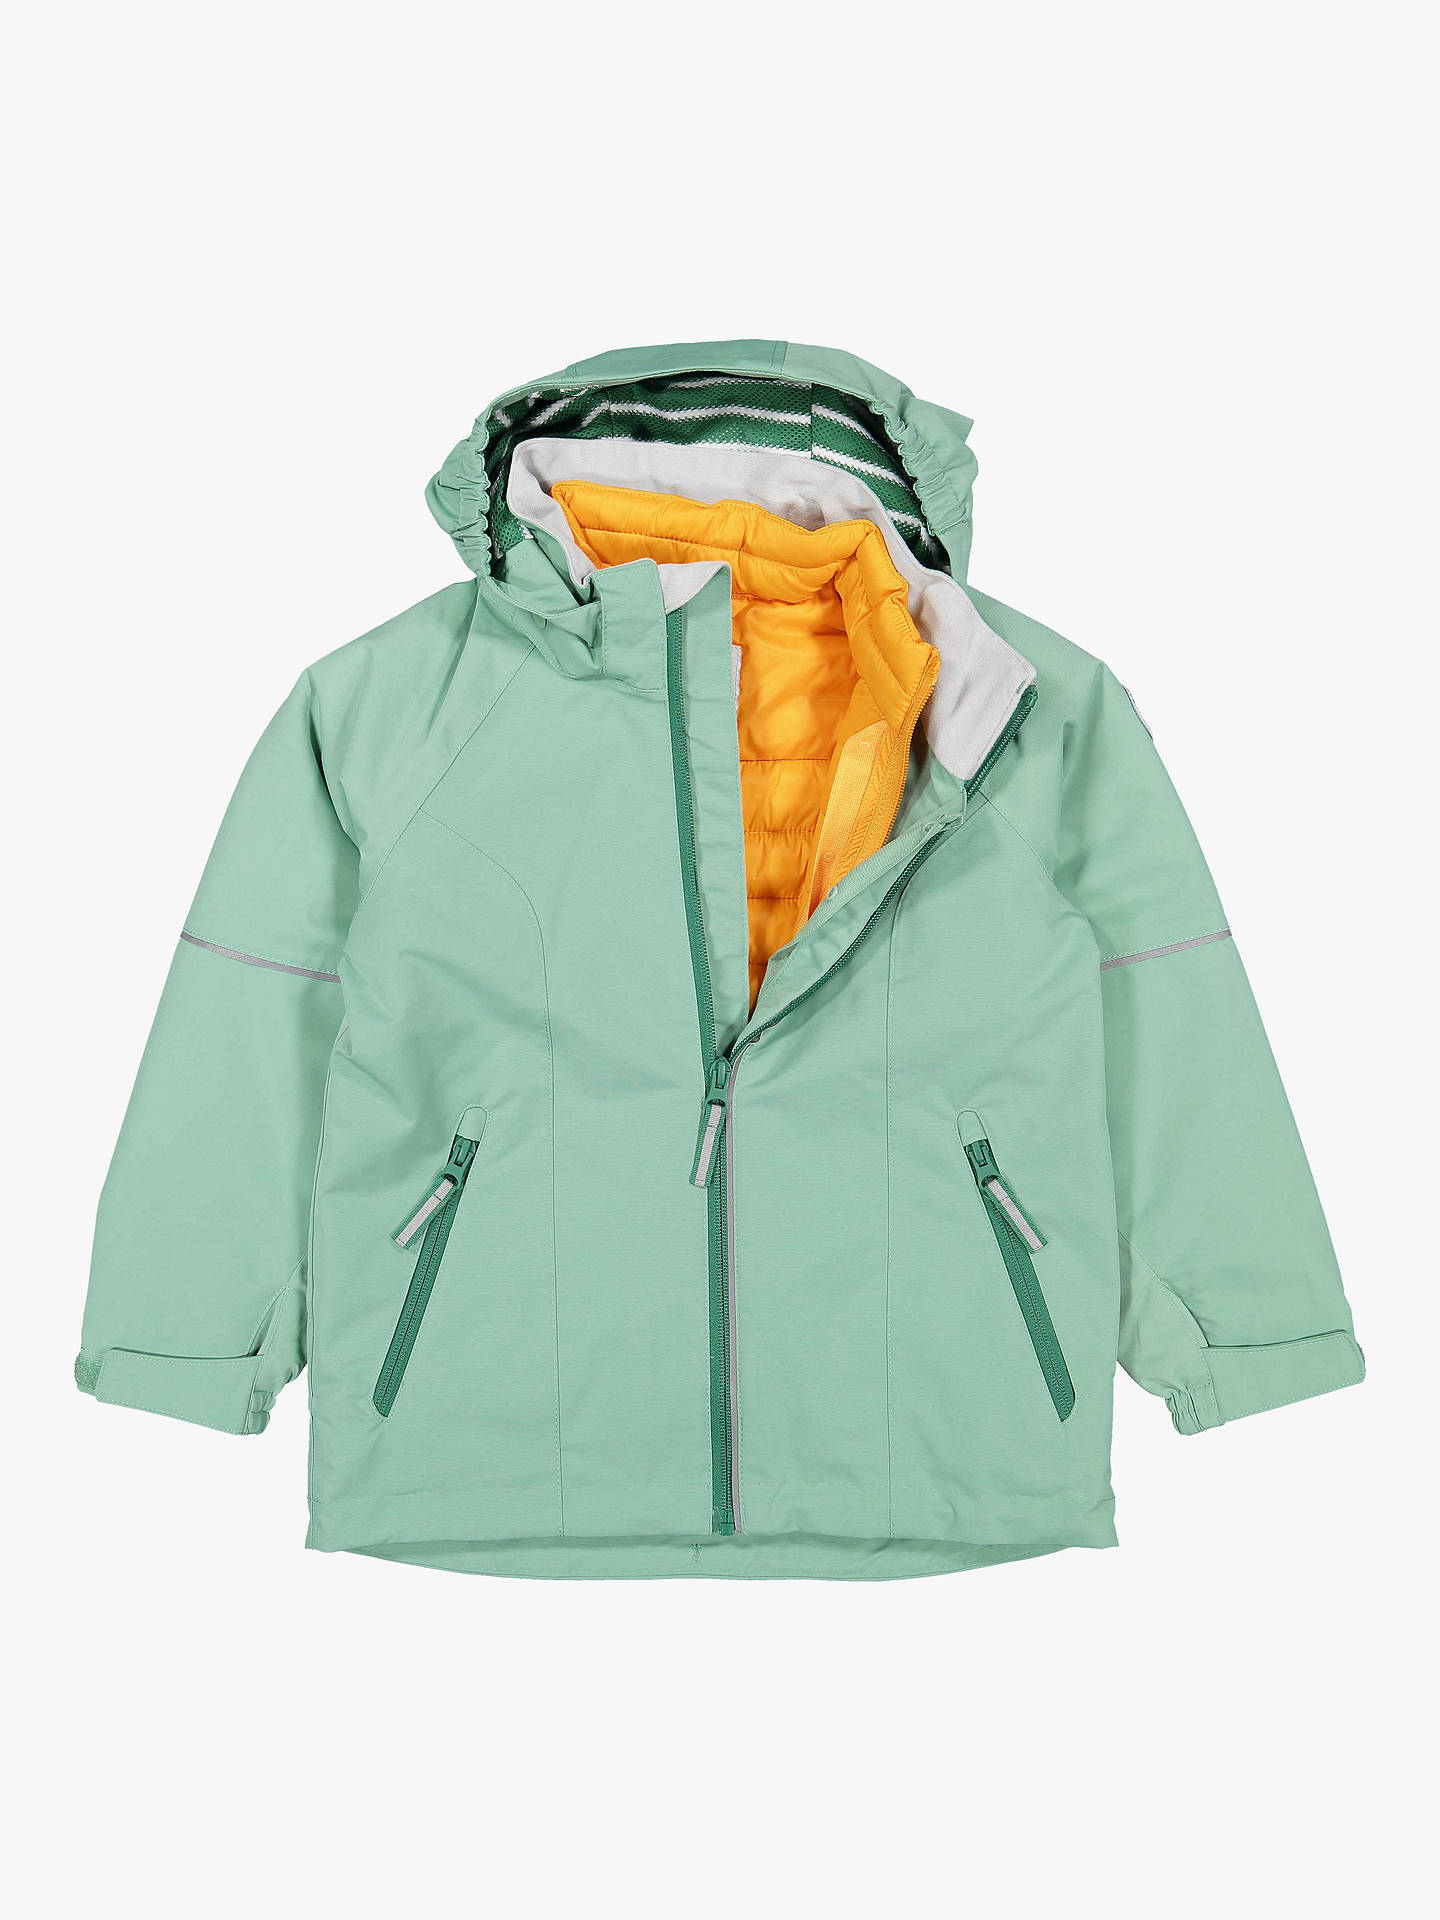 48d2c3e41 Polarn O. Pyret Baby Puffer Jacket at John Lewis   Partners